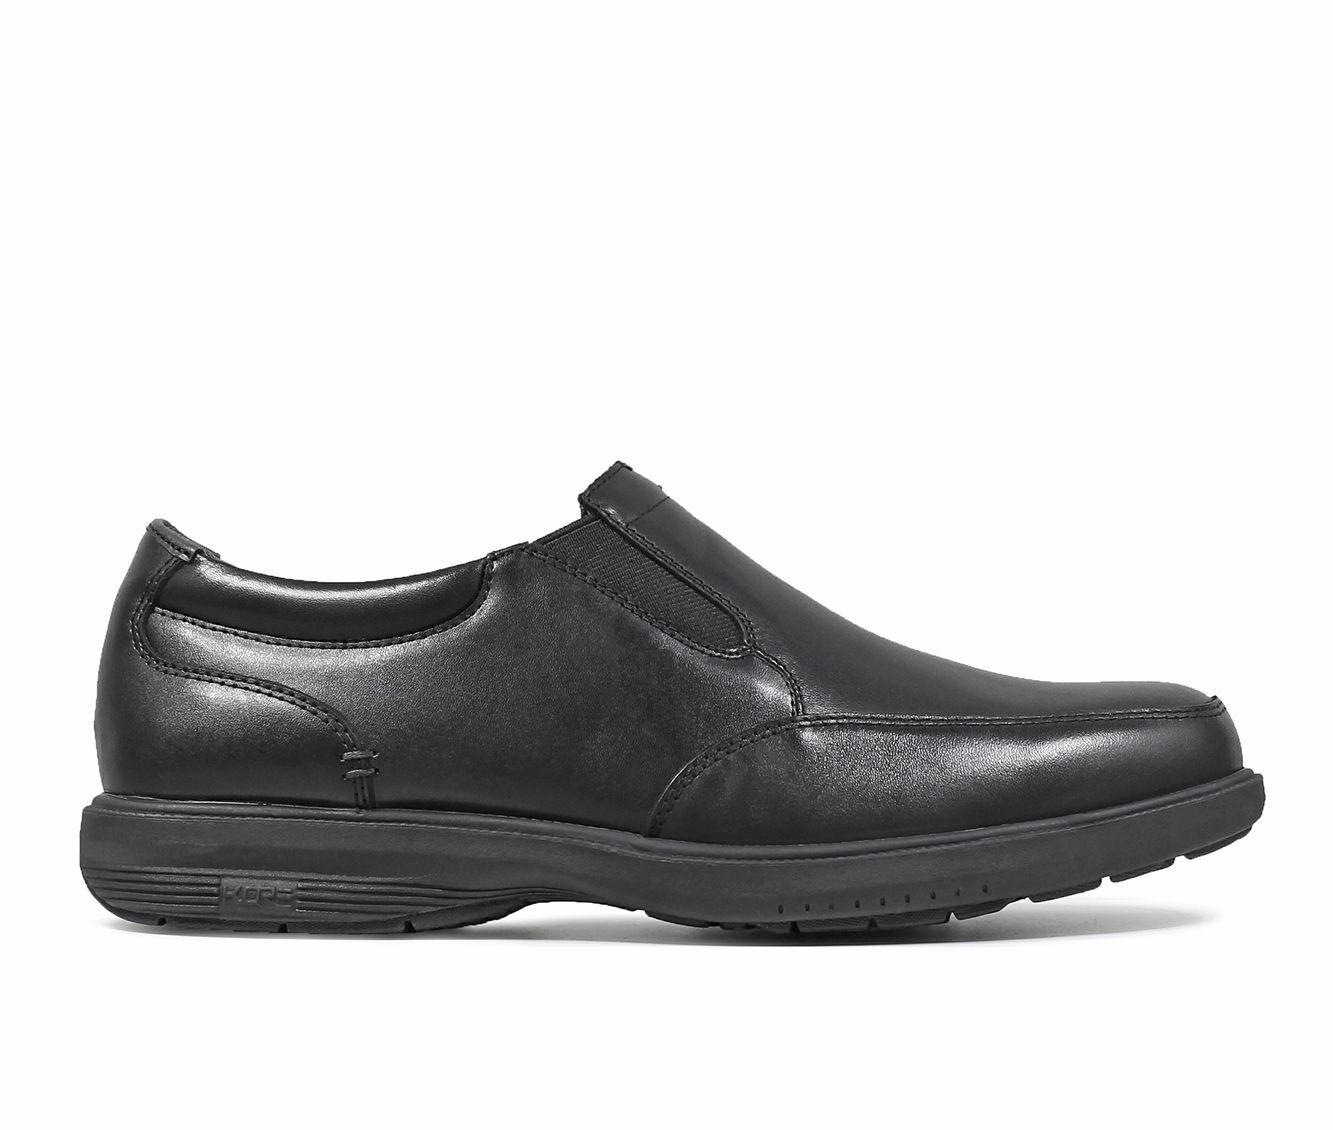 Purchase Price Men's Nunn Bush Myles Street Moc Toe Slip-On Slip-On Shoes Black